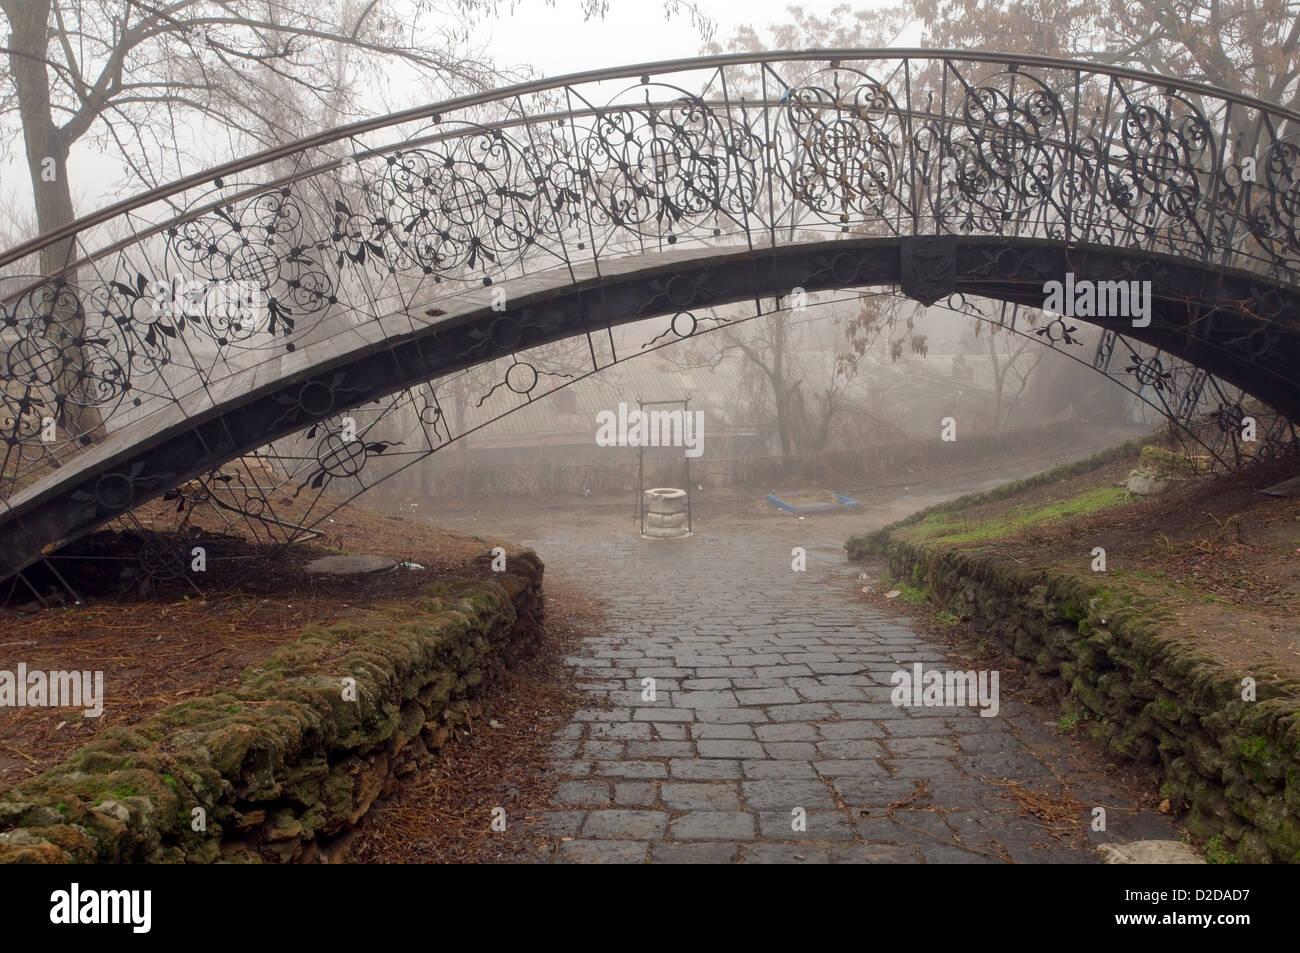 Humpbacked bridge in the fog, Odessa, Ukraine, Europe - Stock Image